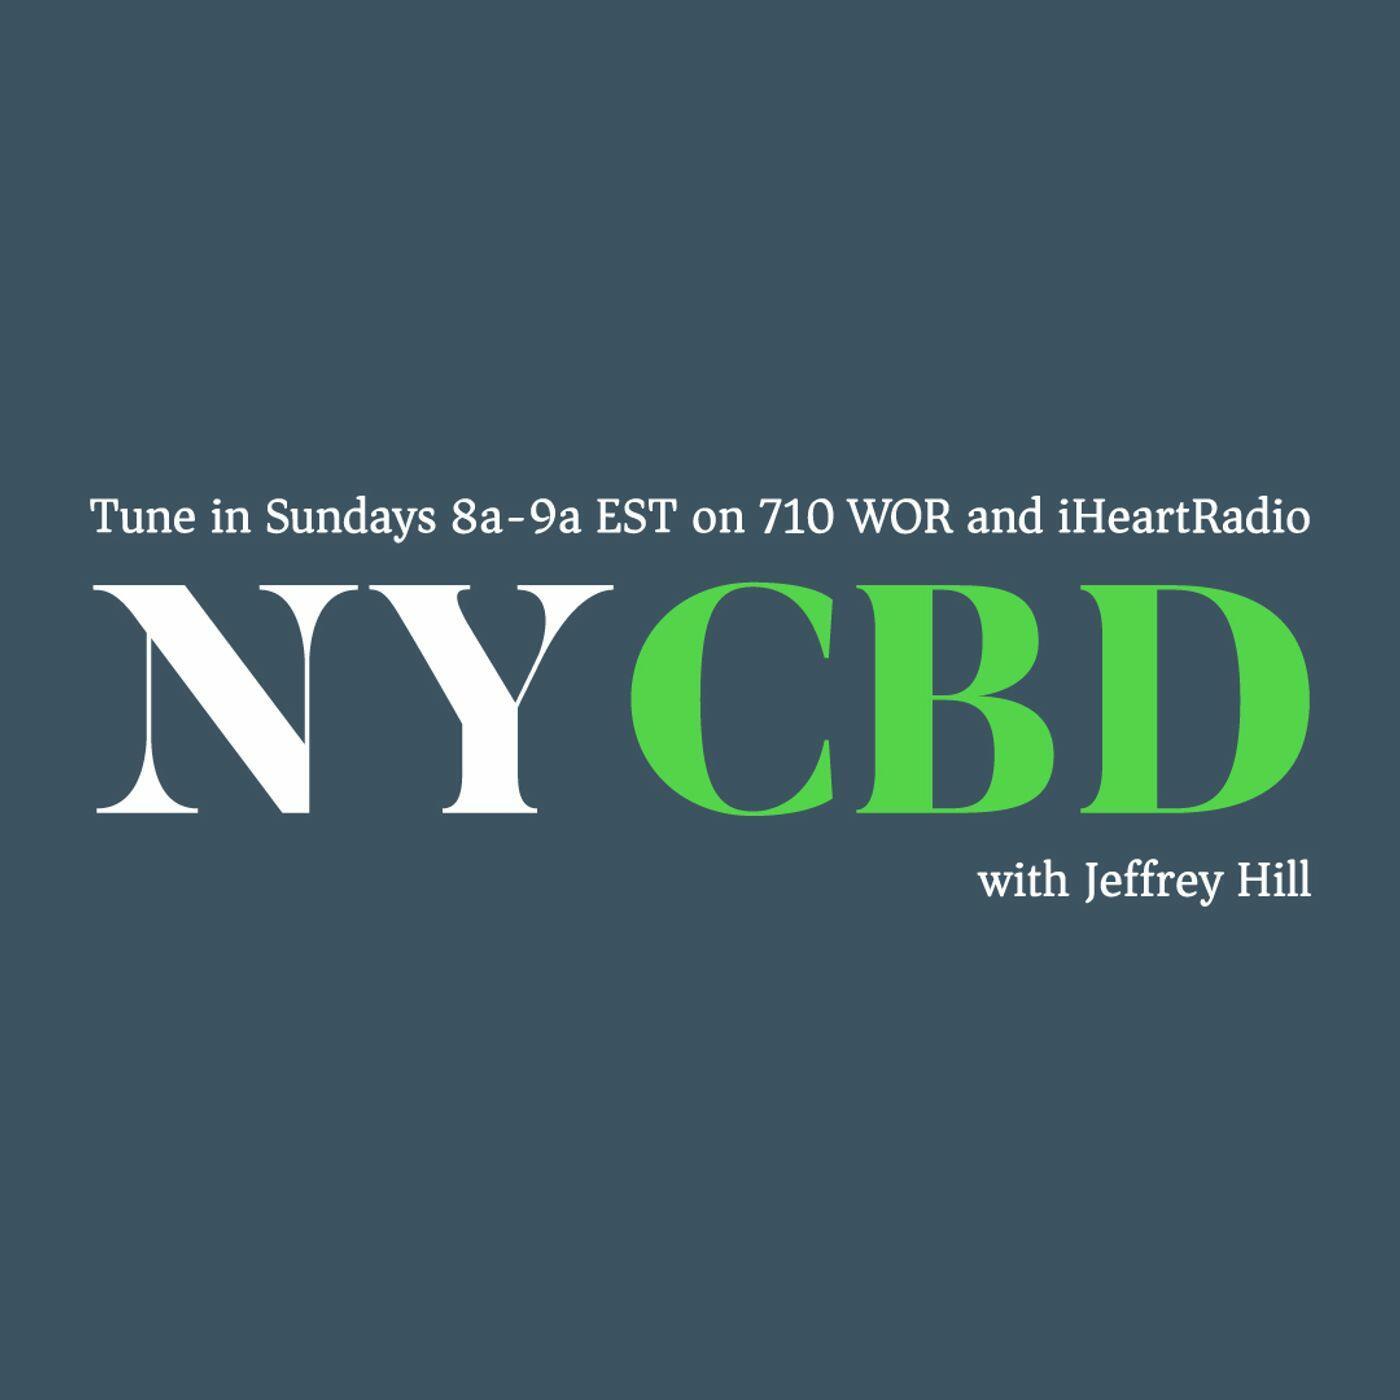 NYCBD With Jeffrey Hill